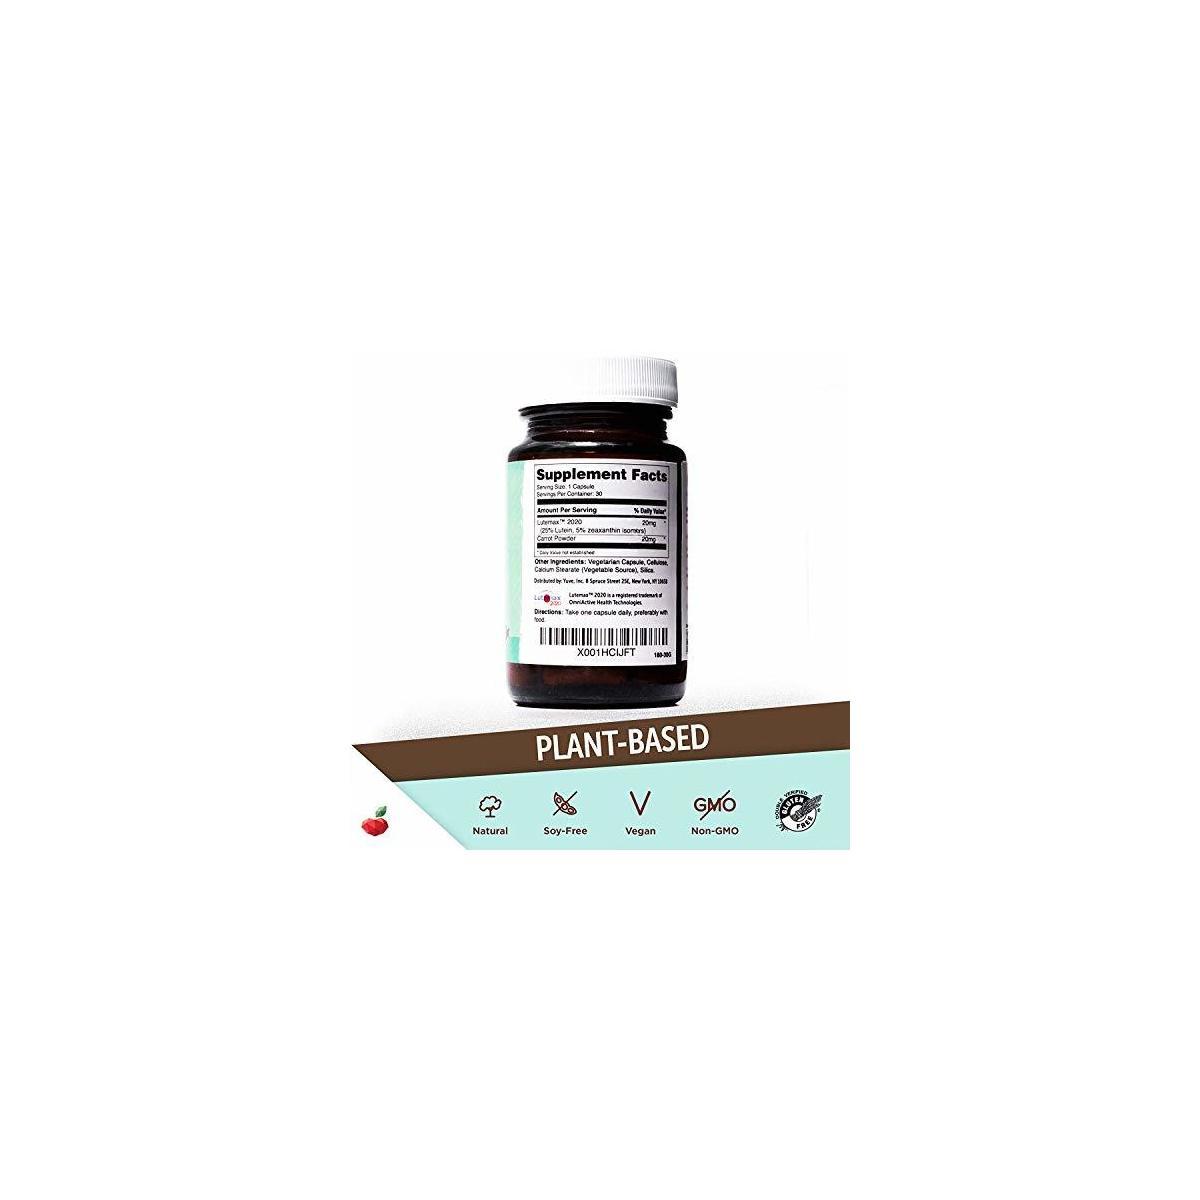 Yuve Natural Lutein 20mg Vitamin Supplement - Benefits for Dry Eyes - Reduce Eye Strain & Fatigue - Vegan, Non-GMO, Gluten-Free - Memory, Brain and Focus Booster - Lutemax 2020-30 Veggie Caps